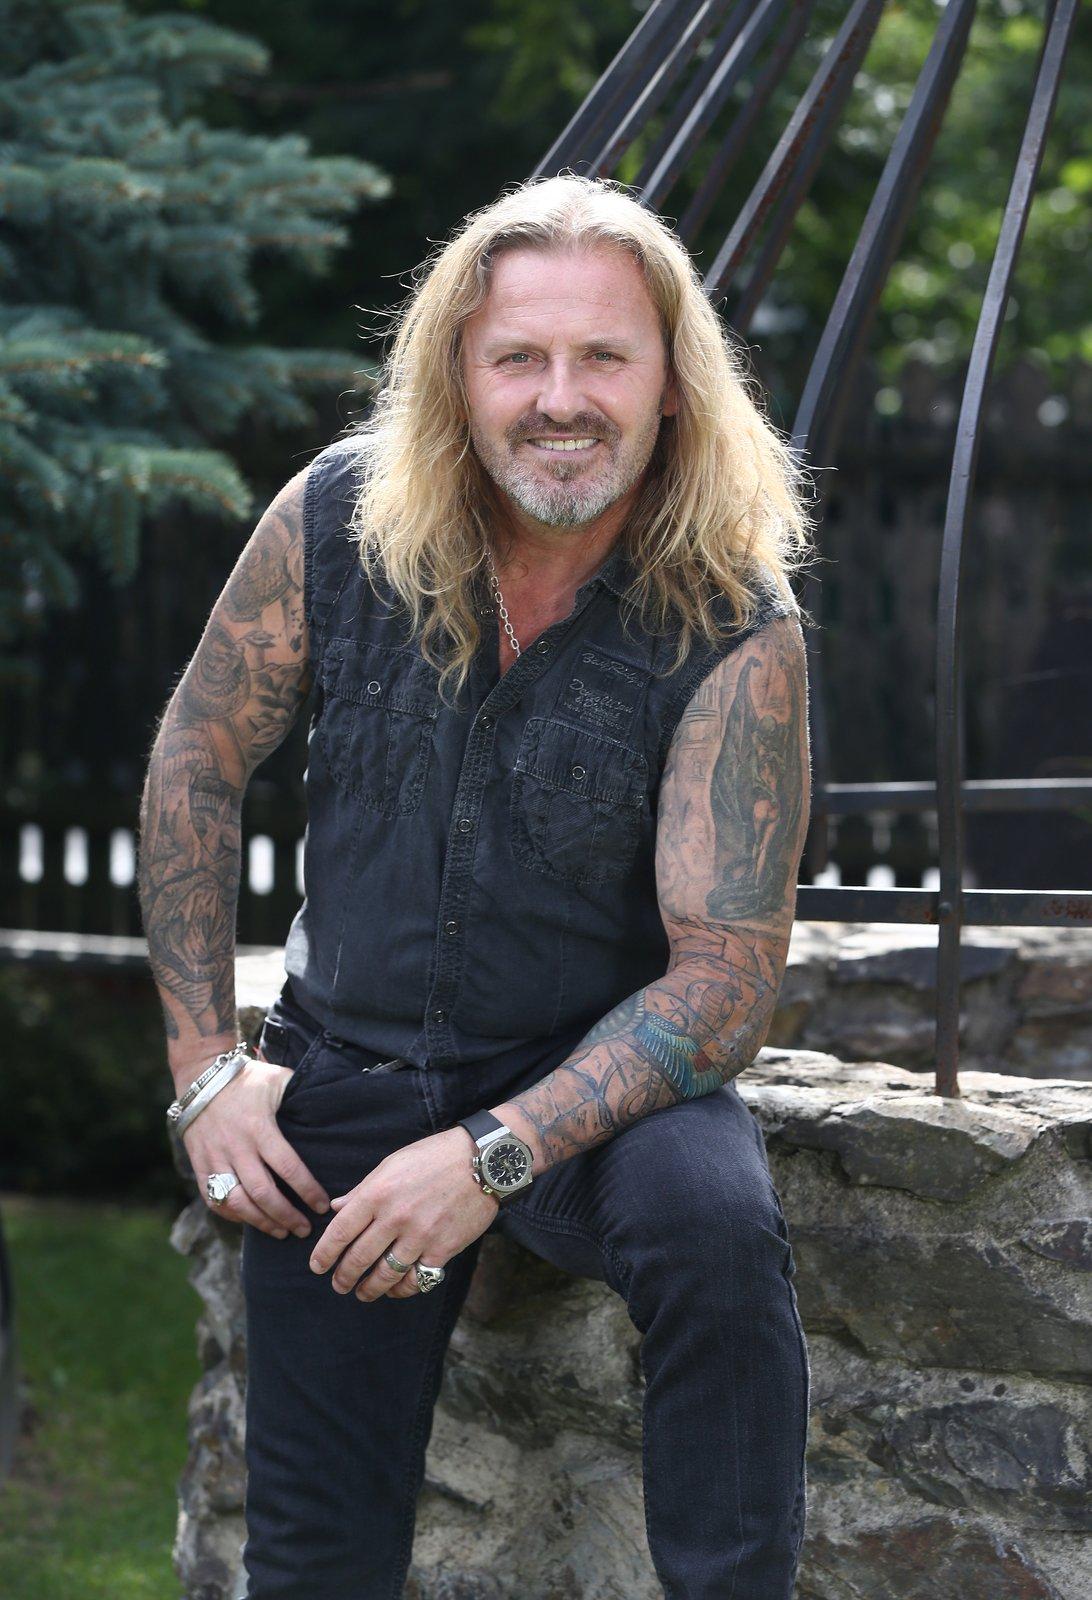 Rocker Pepa Vojtek